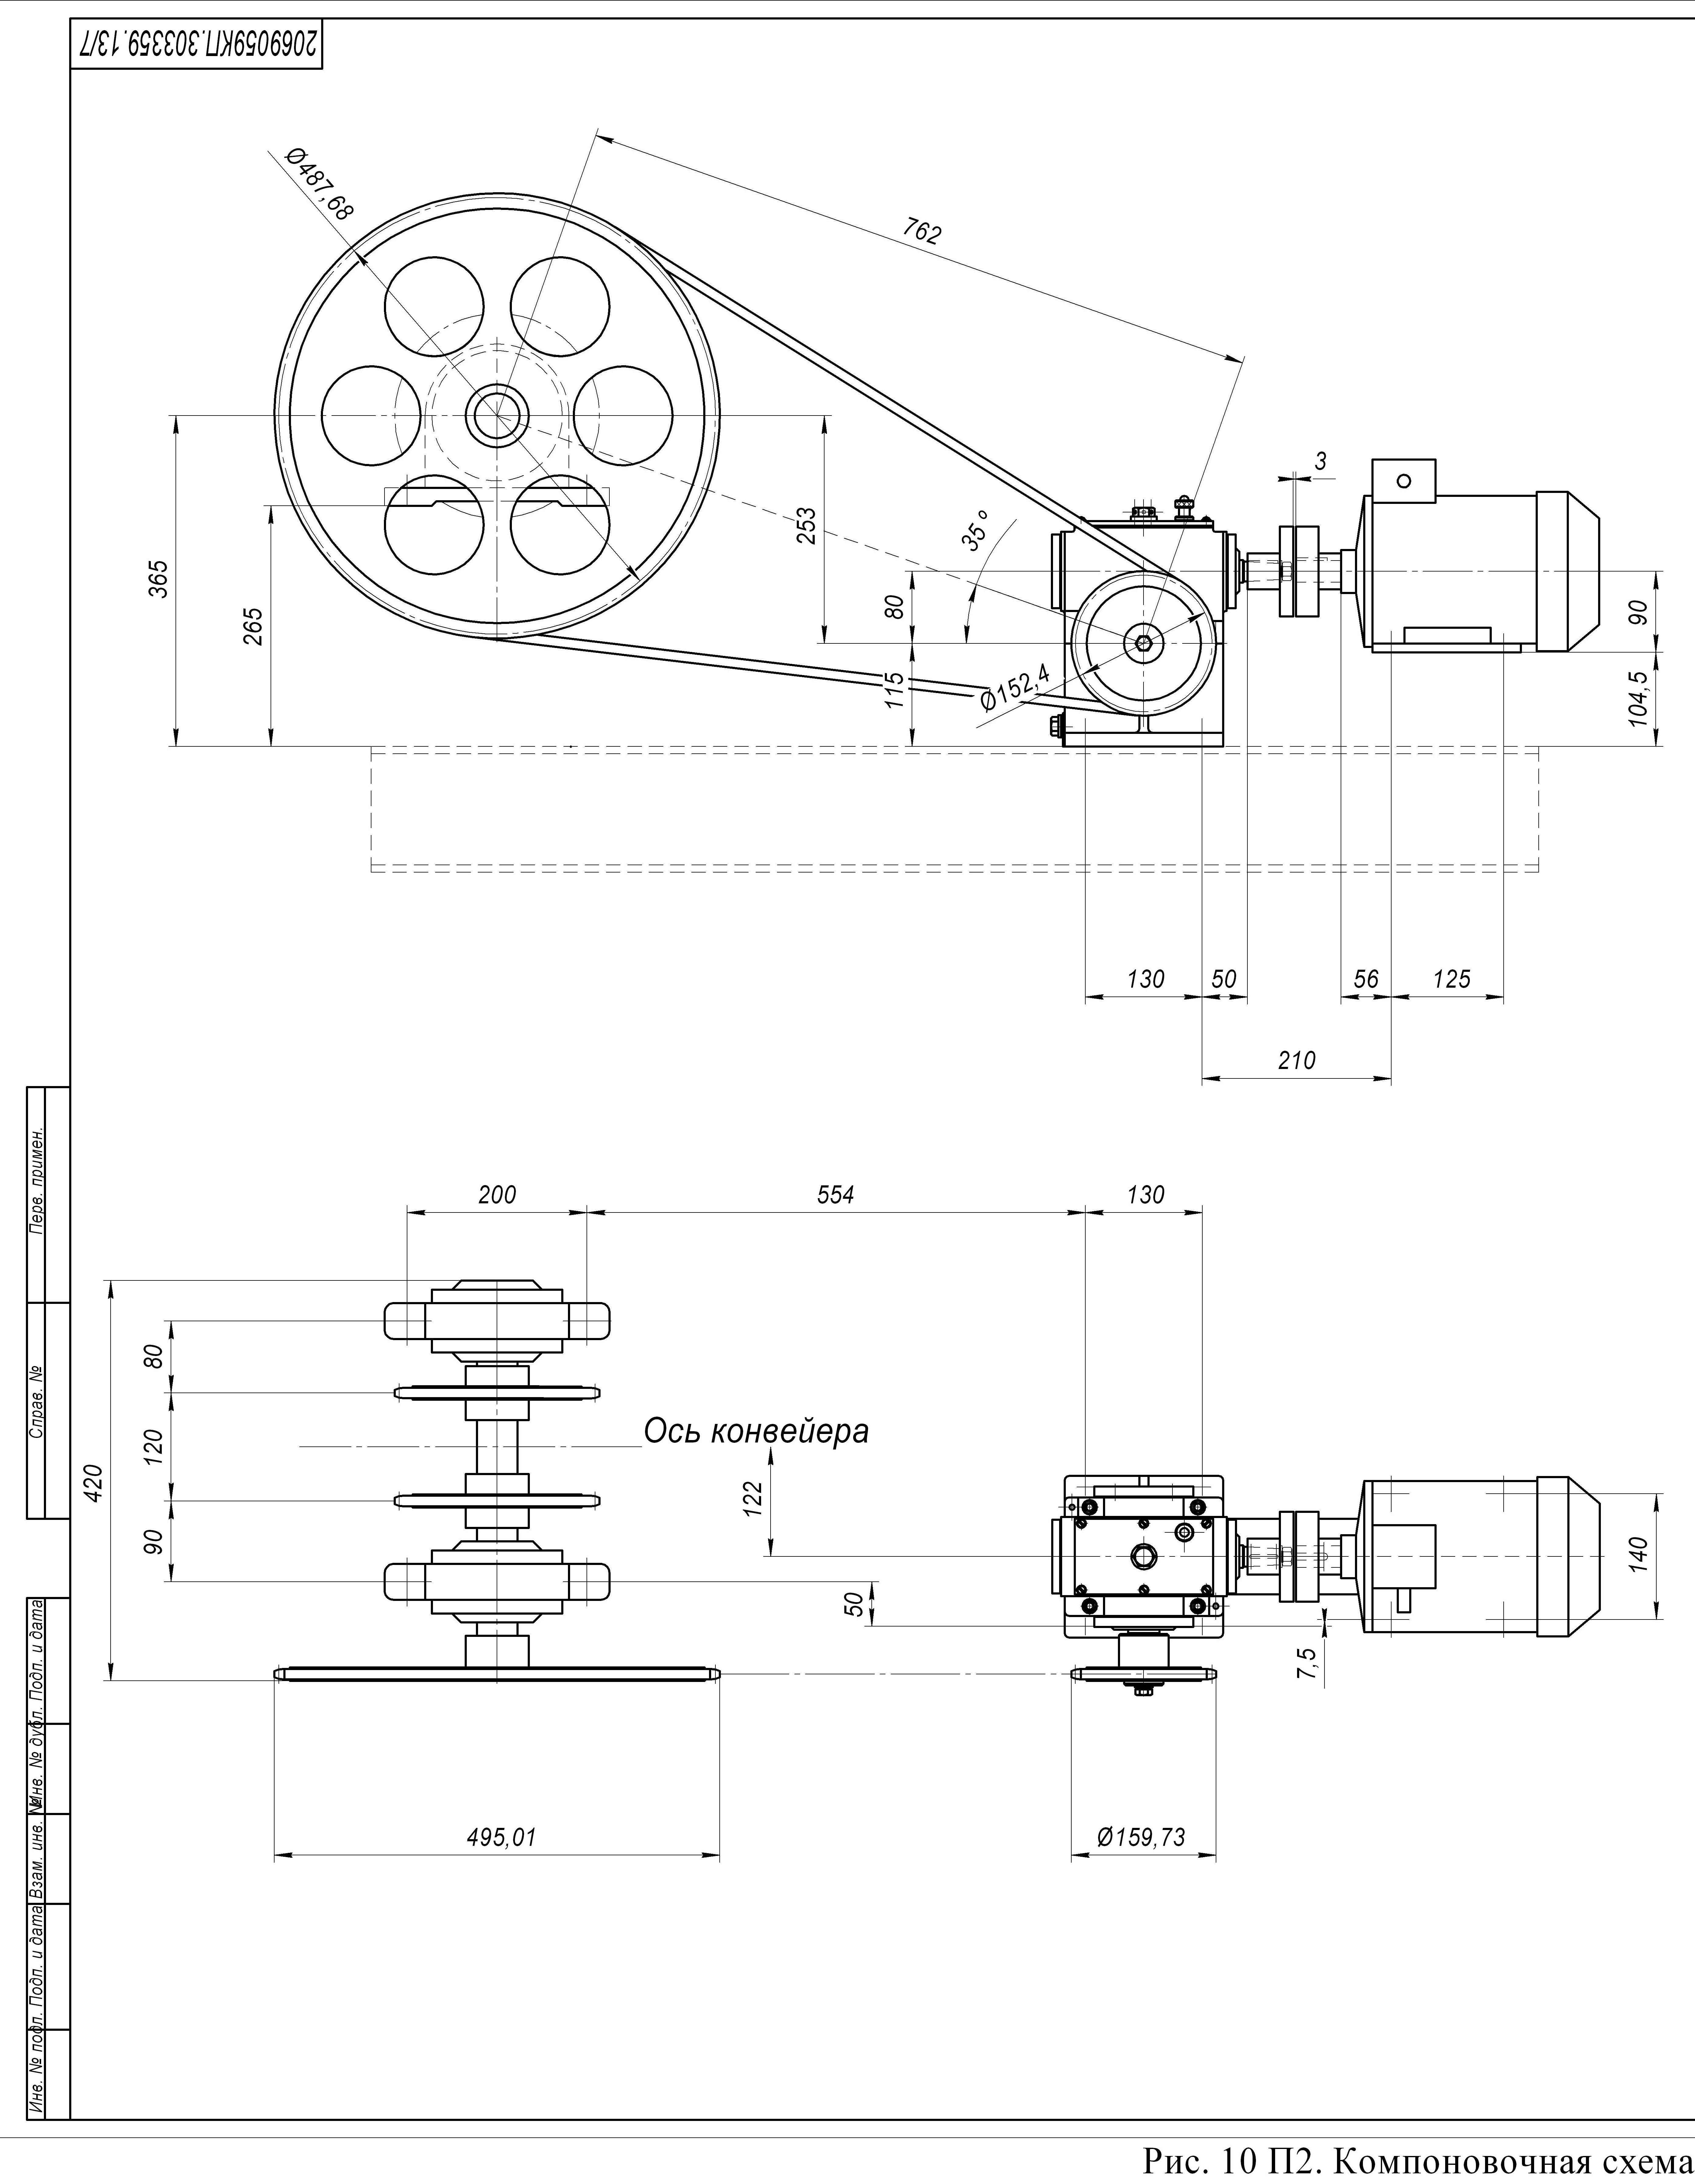 Эксплуатации цепного конвейера транспортер колосового шнека